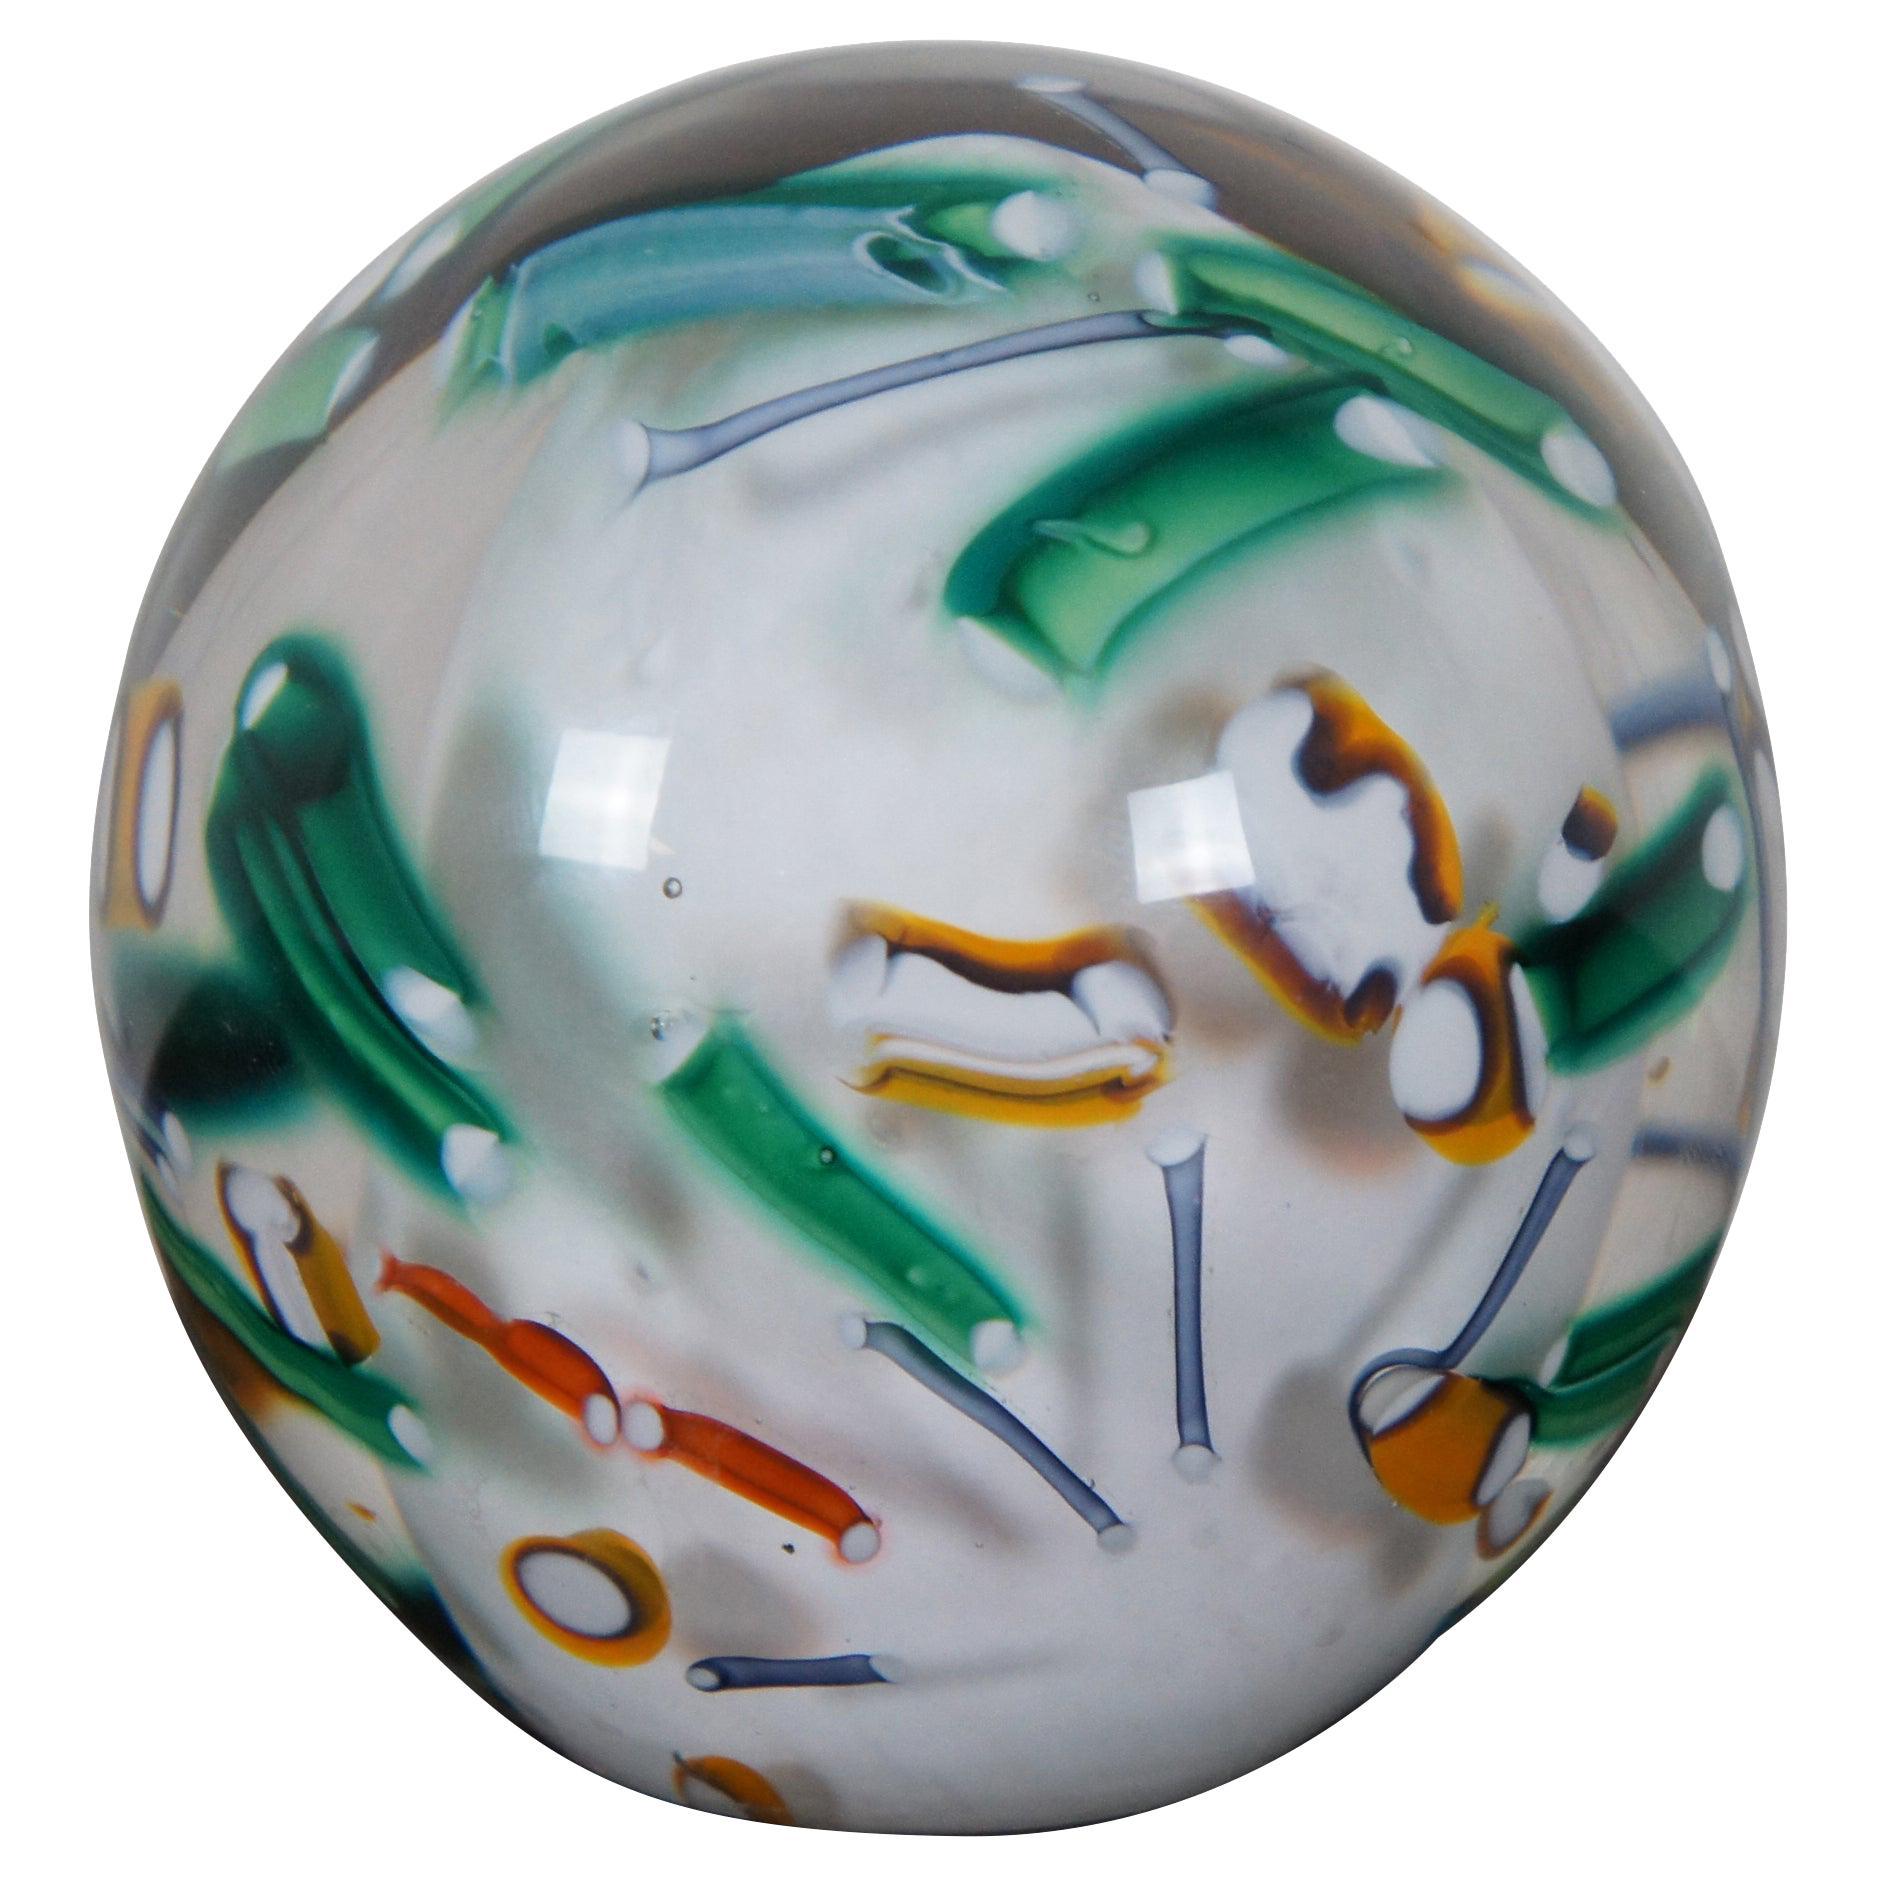 Signed Modern Abstract Millefiori Art Glass Hand Blown Paperweight Orb